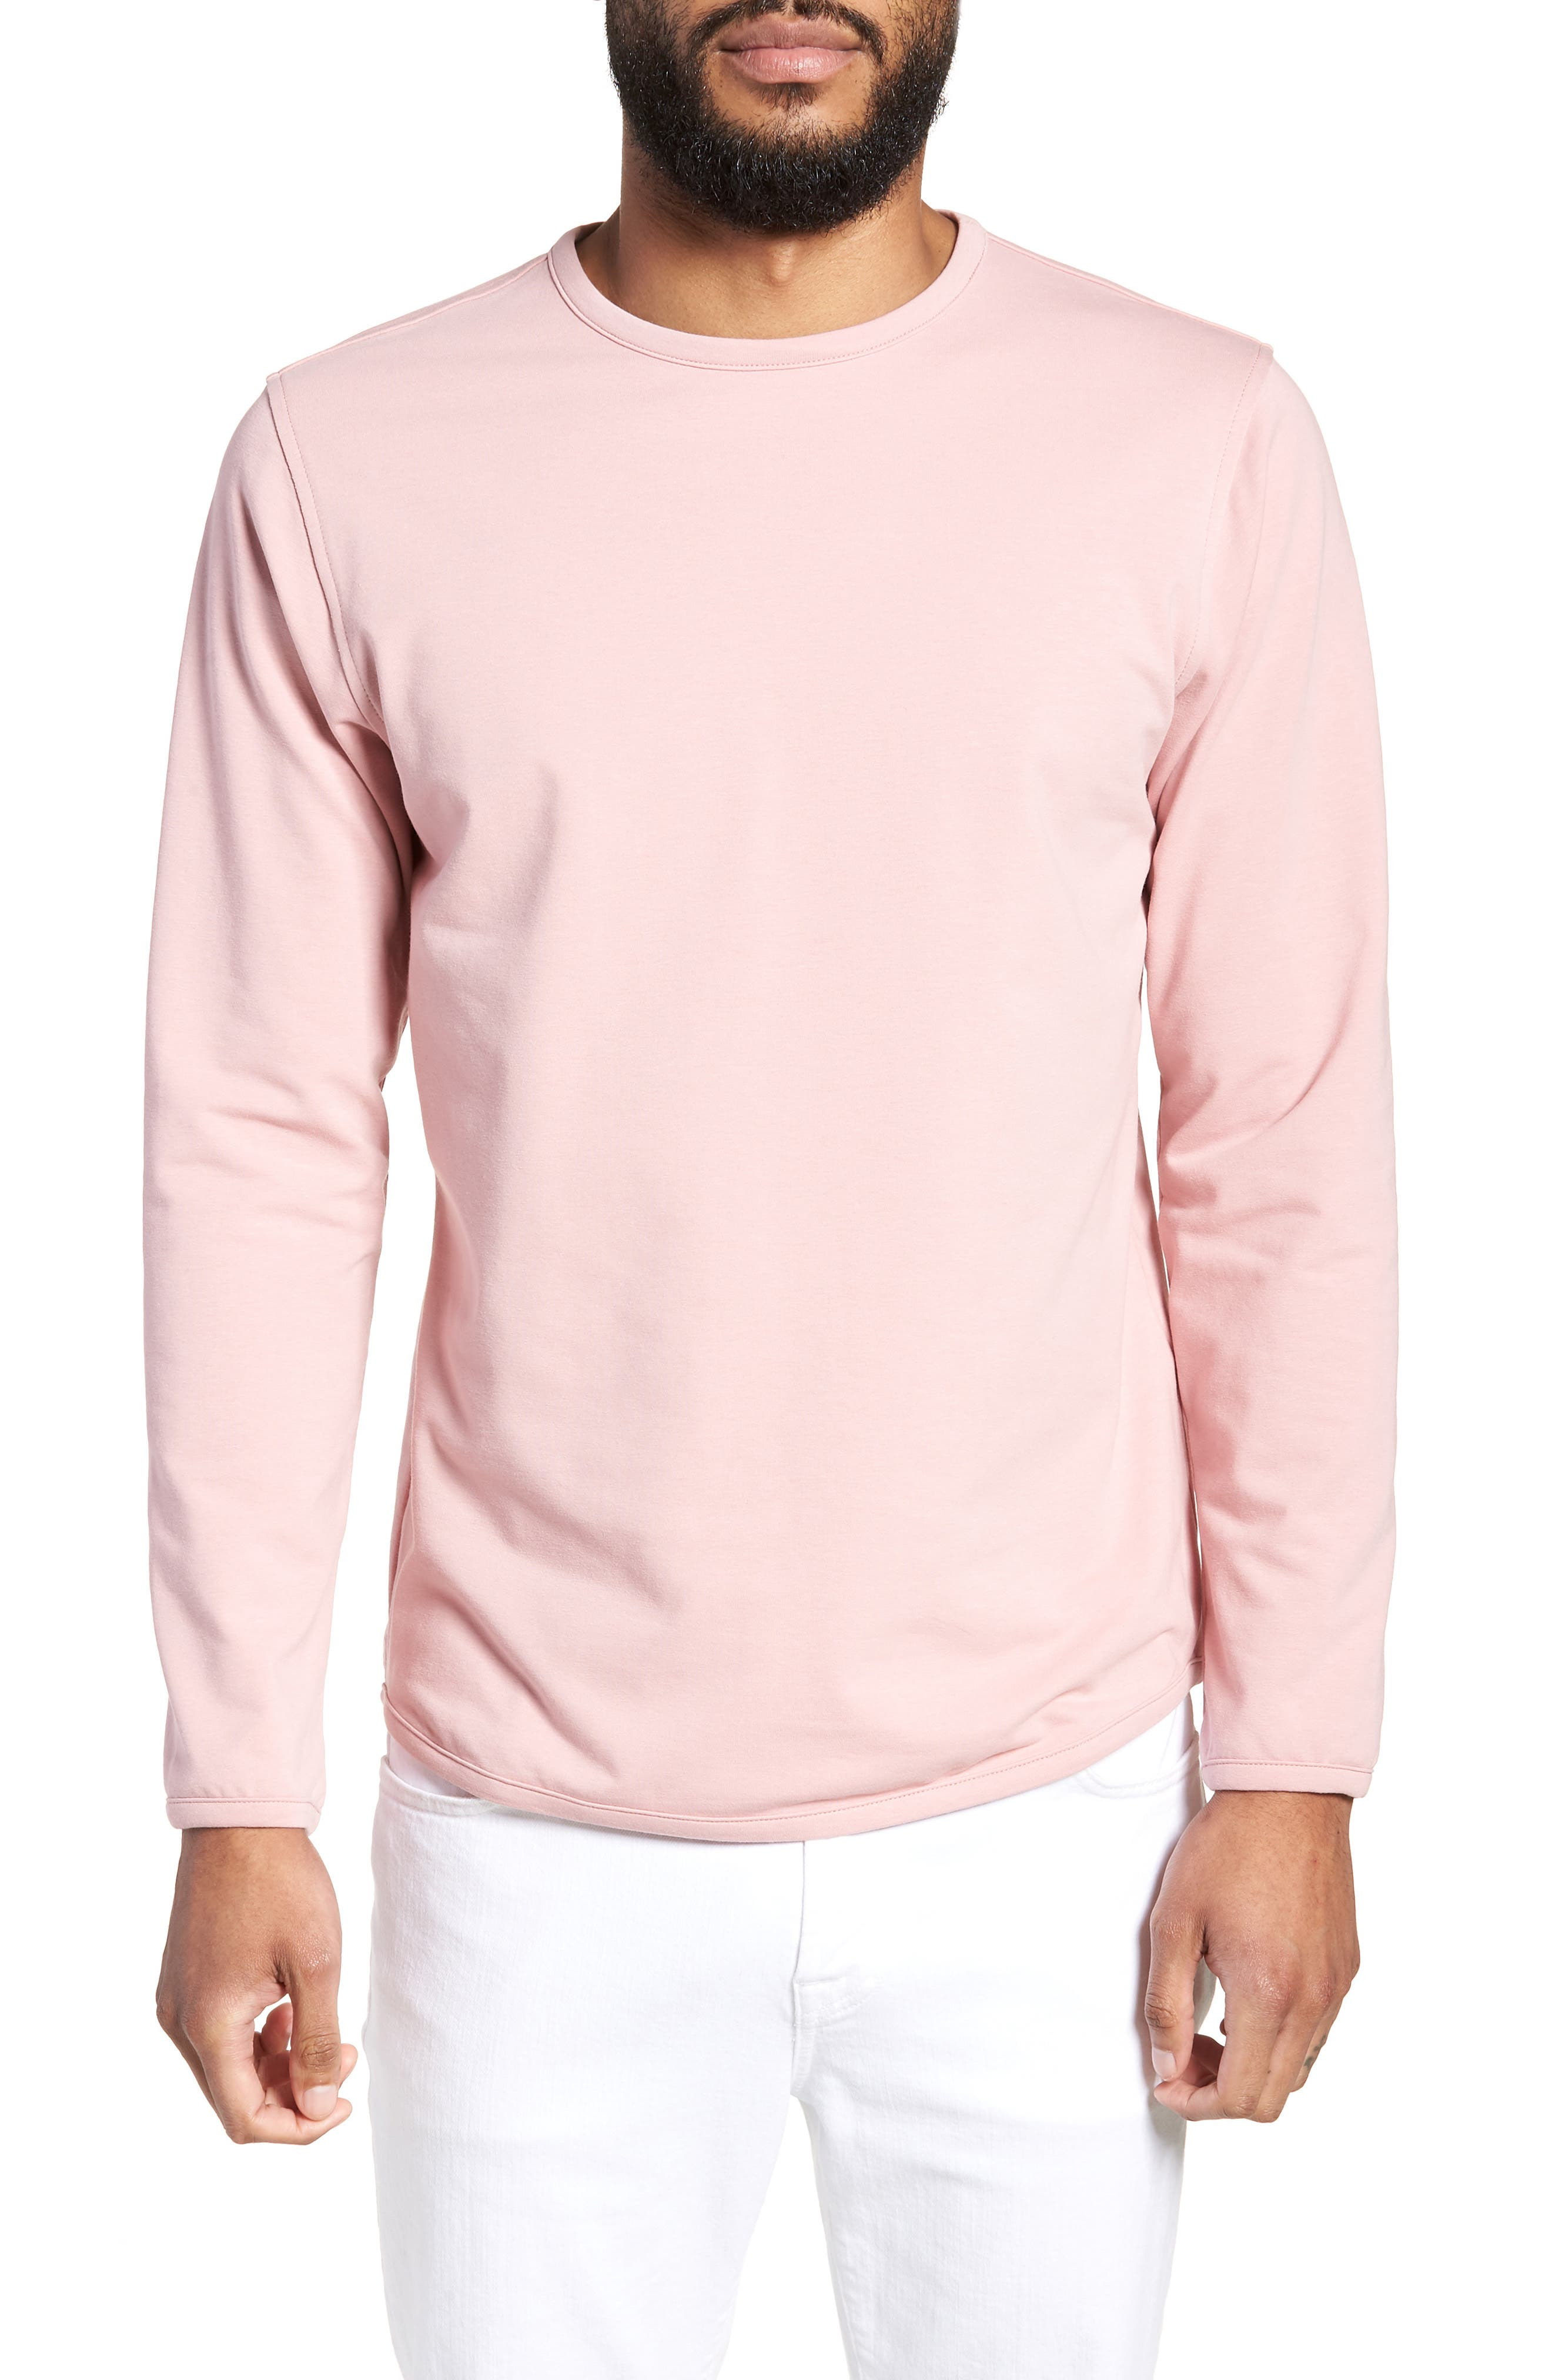 Main Image - TWENTYMETRICTONS Trim Fit Long Sleeve T-Shirt